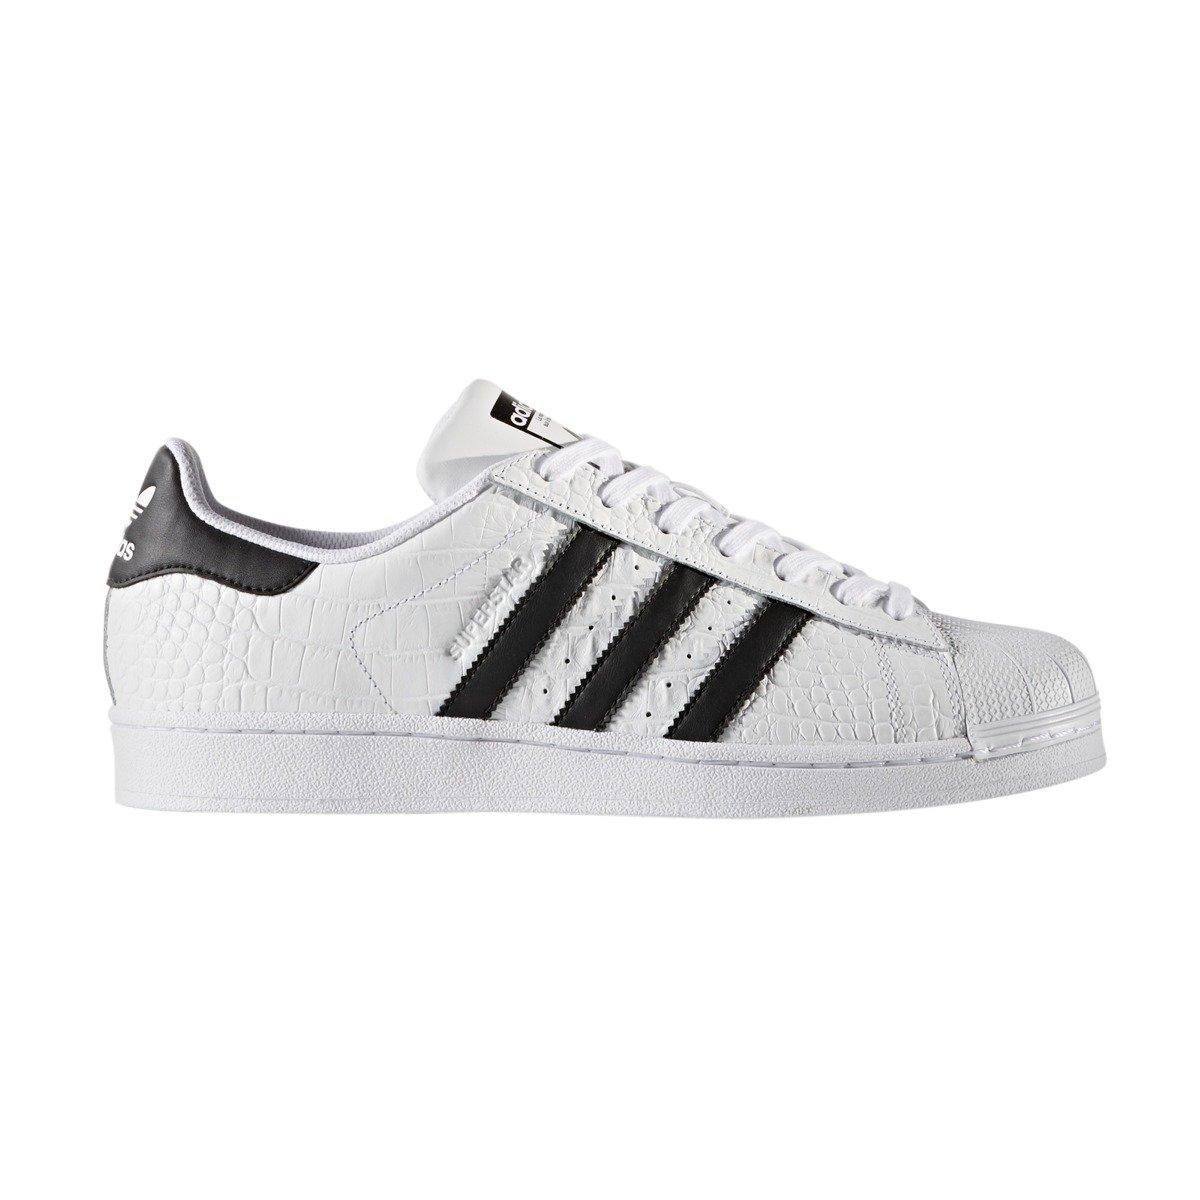 Adidas Originals Superstar Animal Print Shoes BZ0198